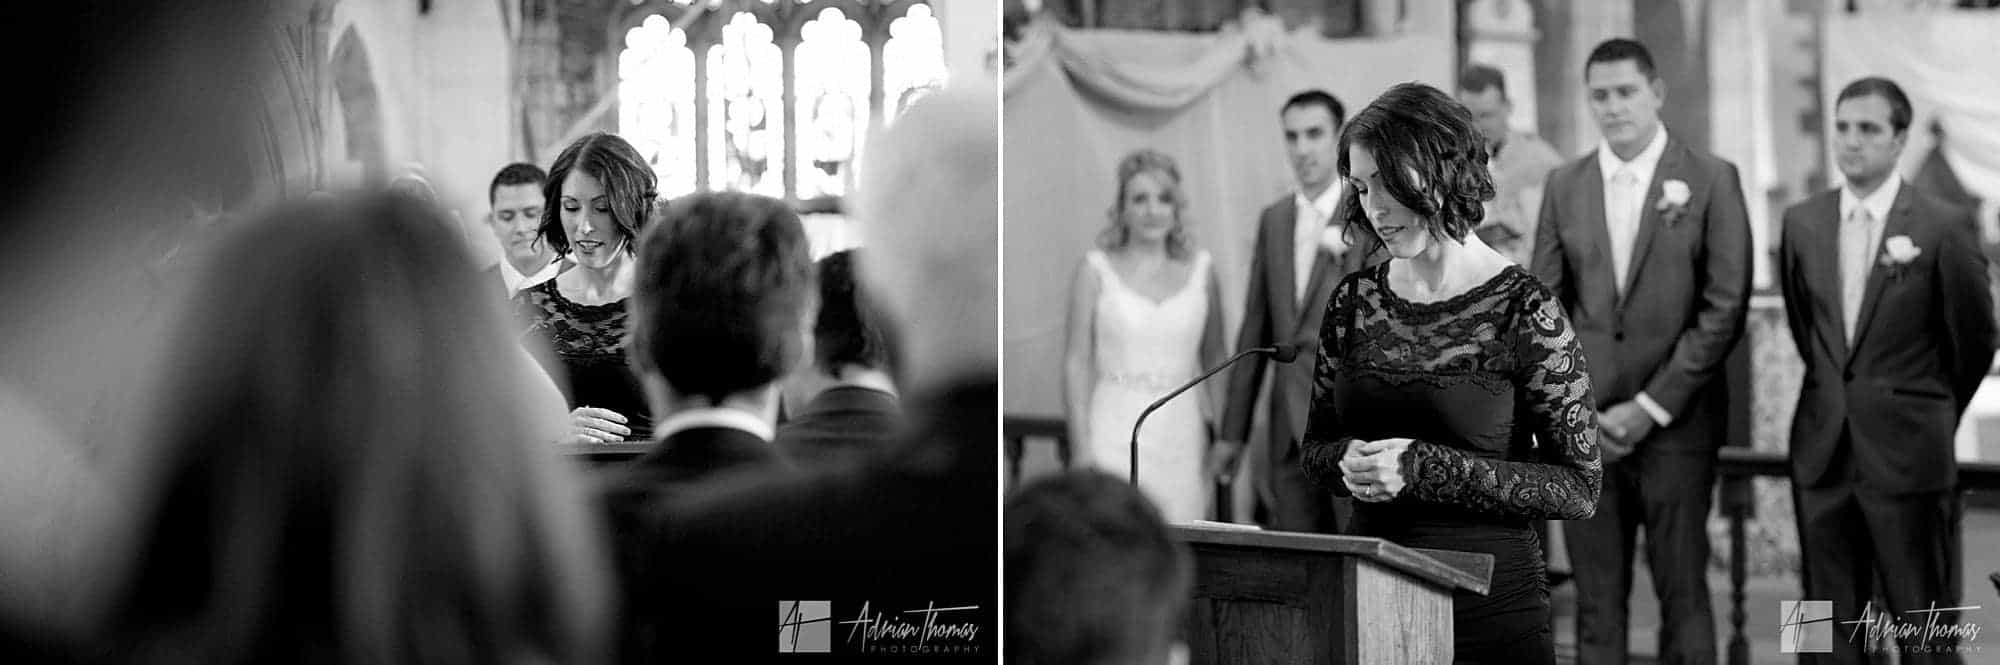 Speech during wedding service.